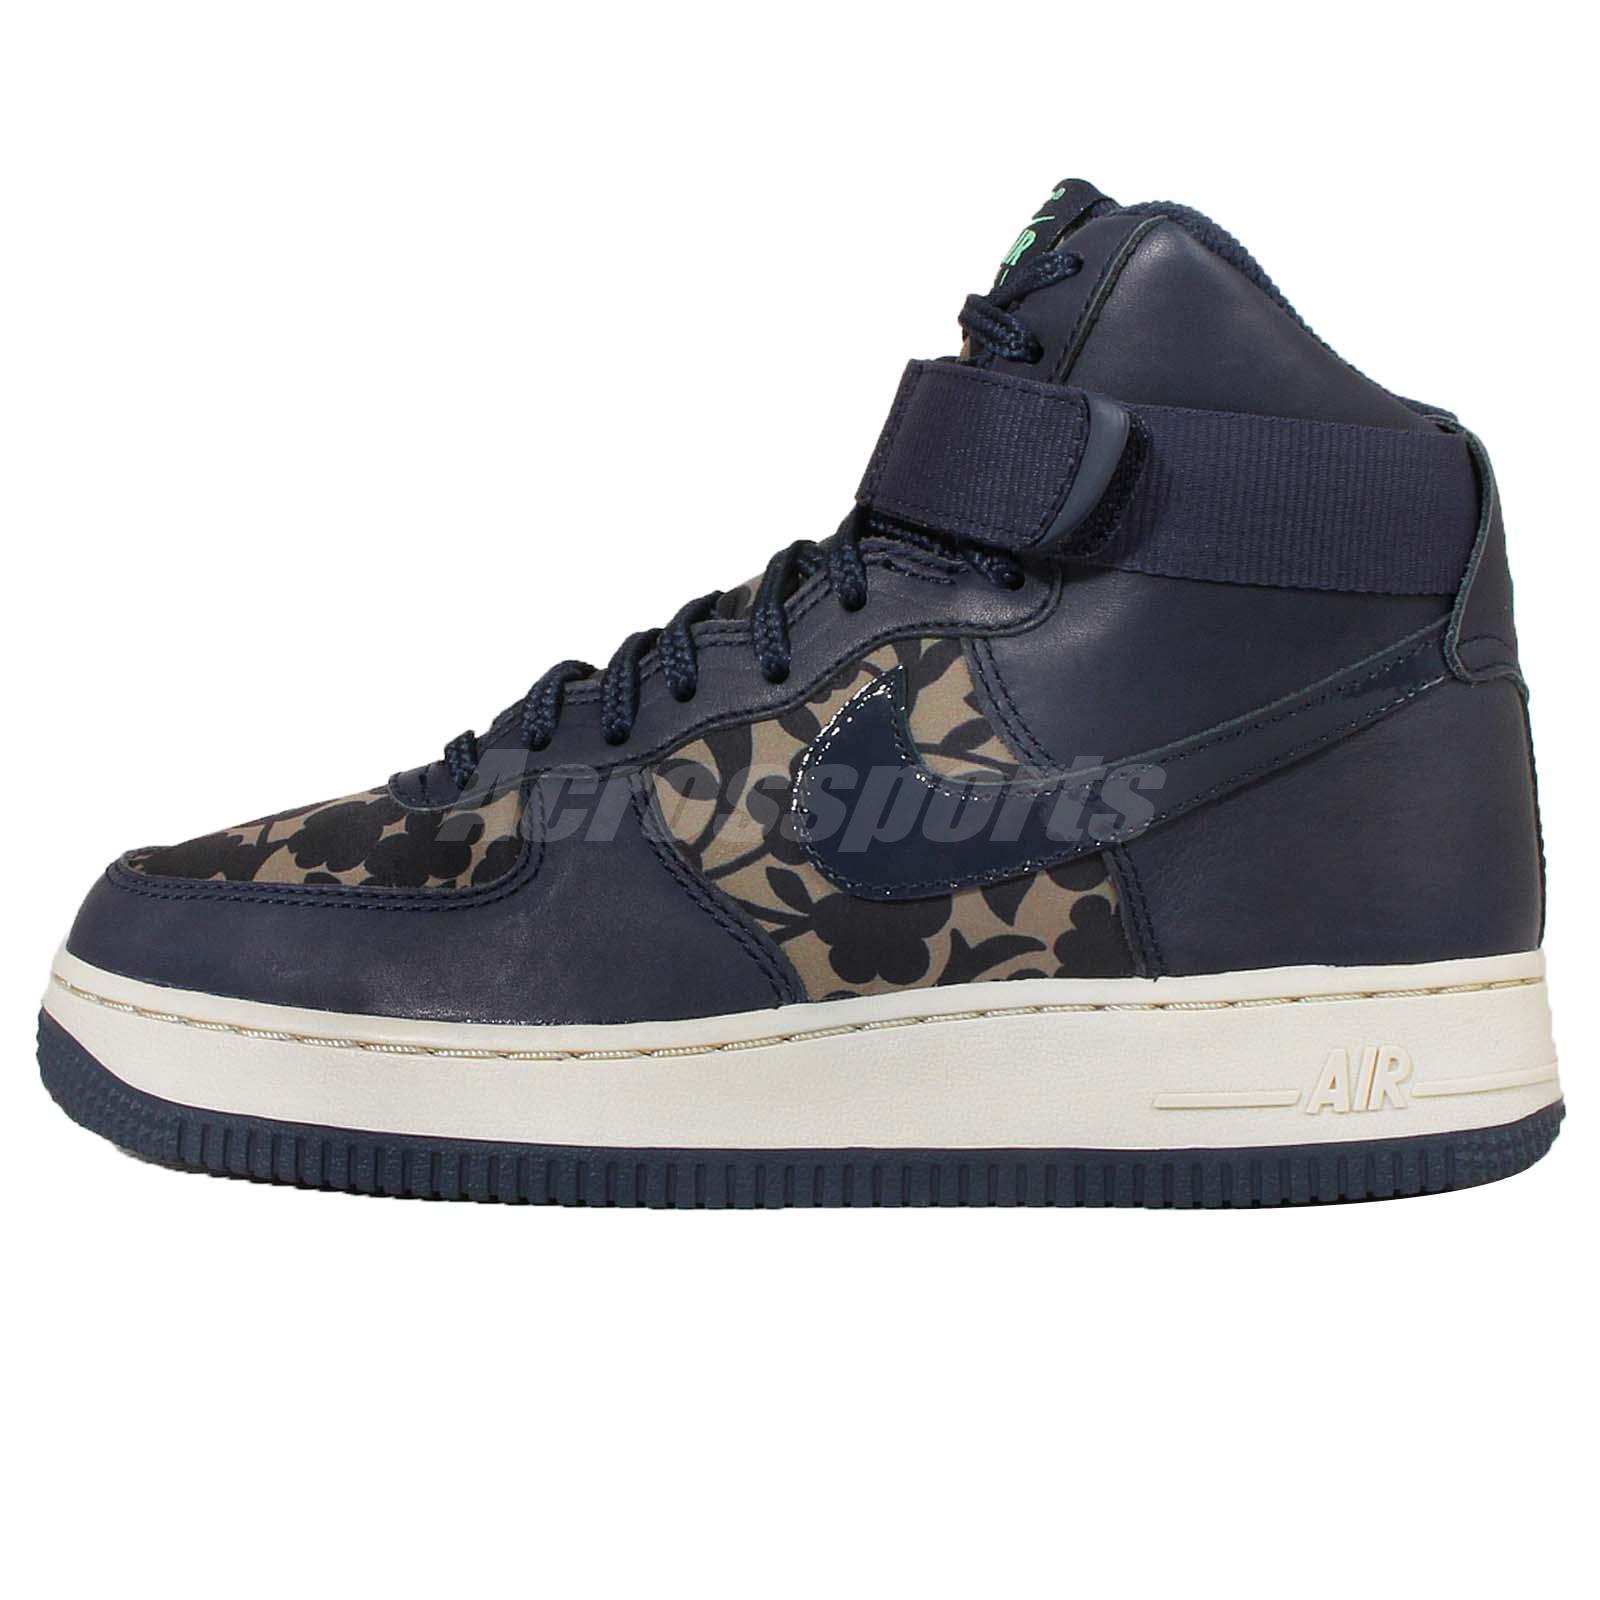 nike air force 1 liberty qs